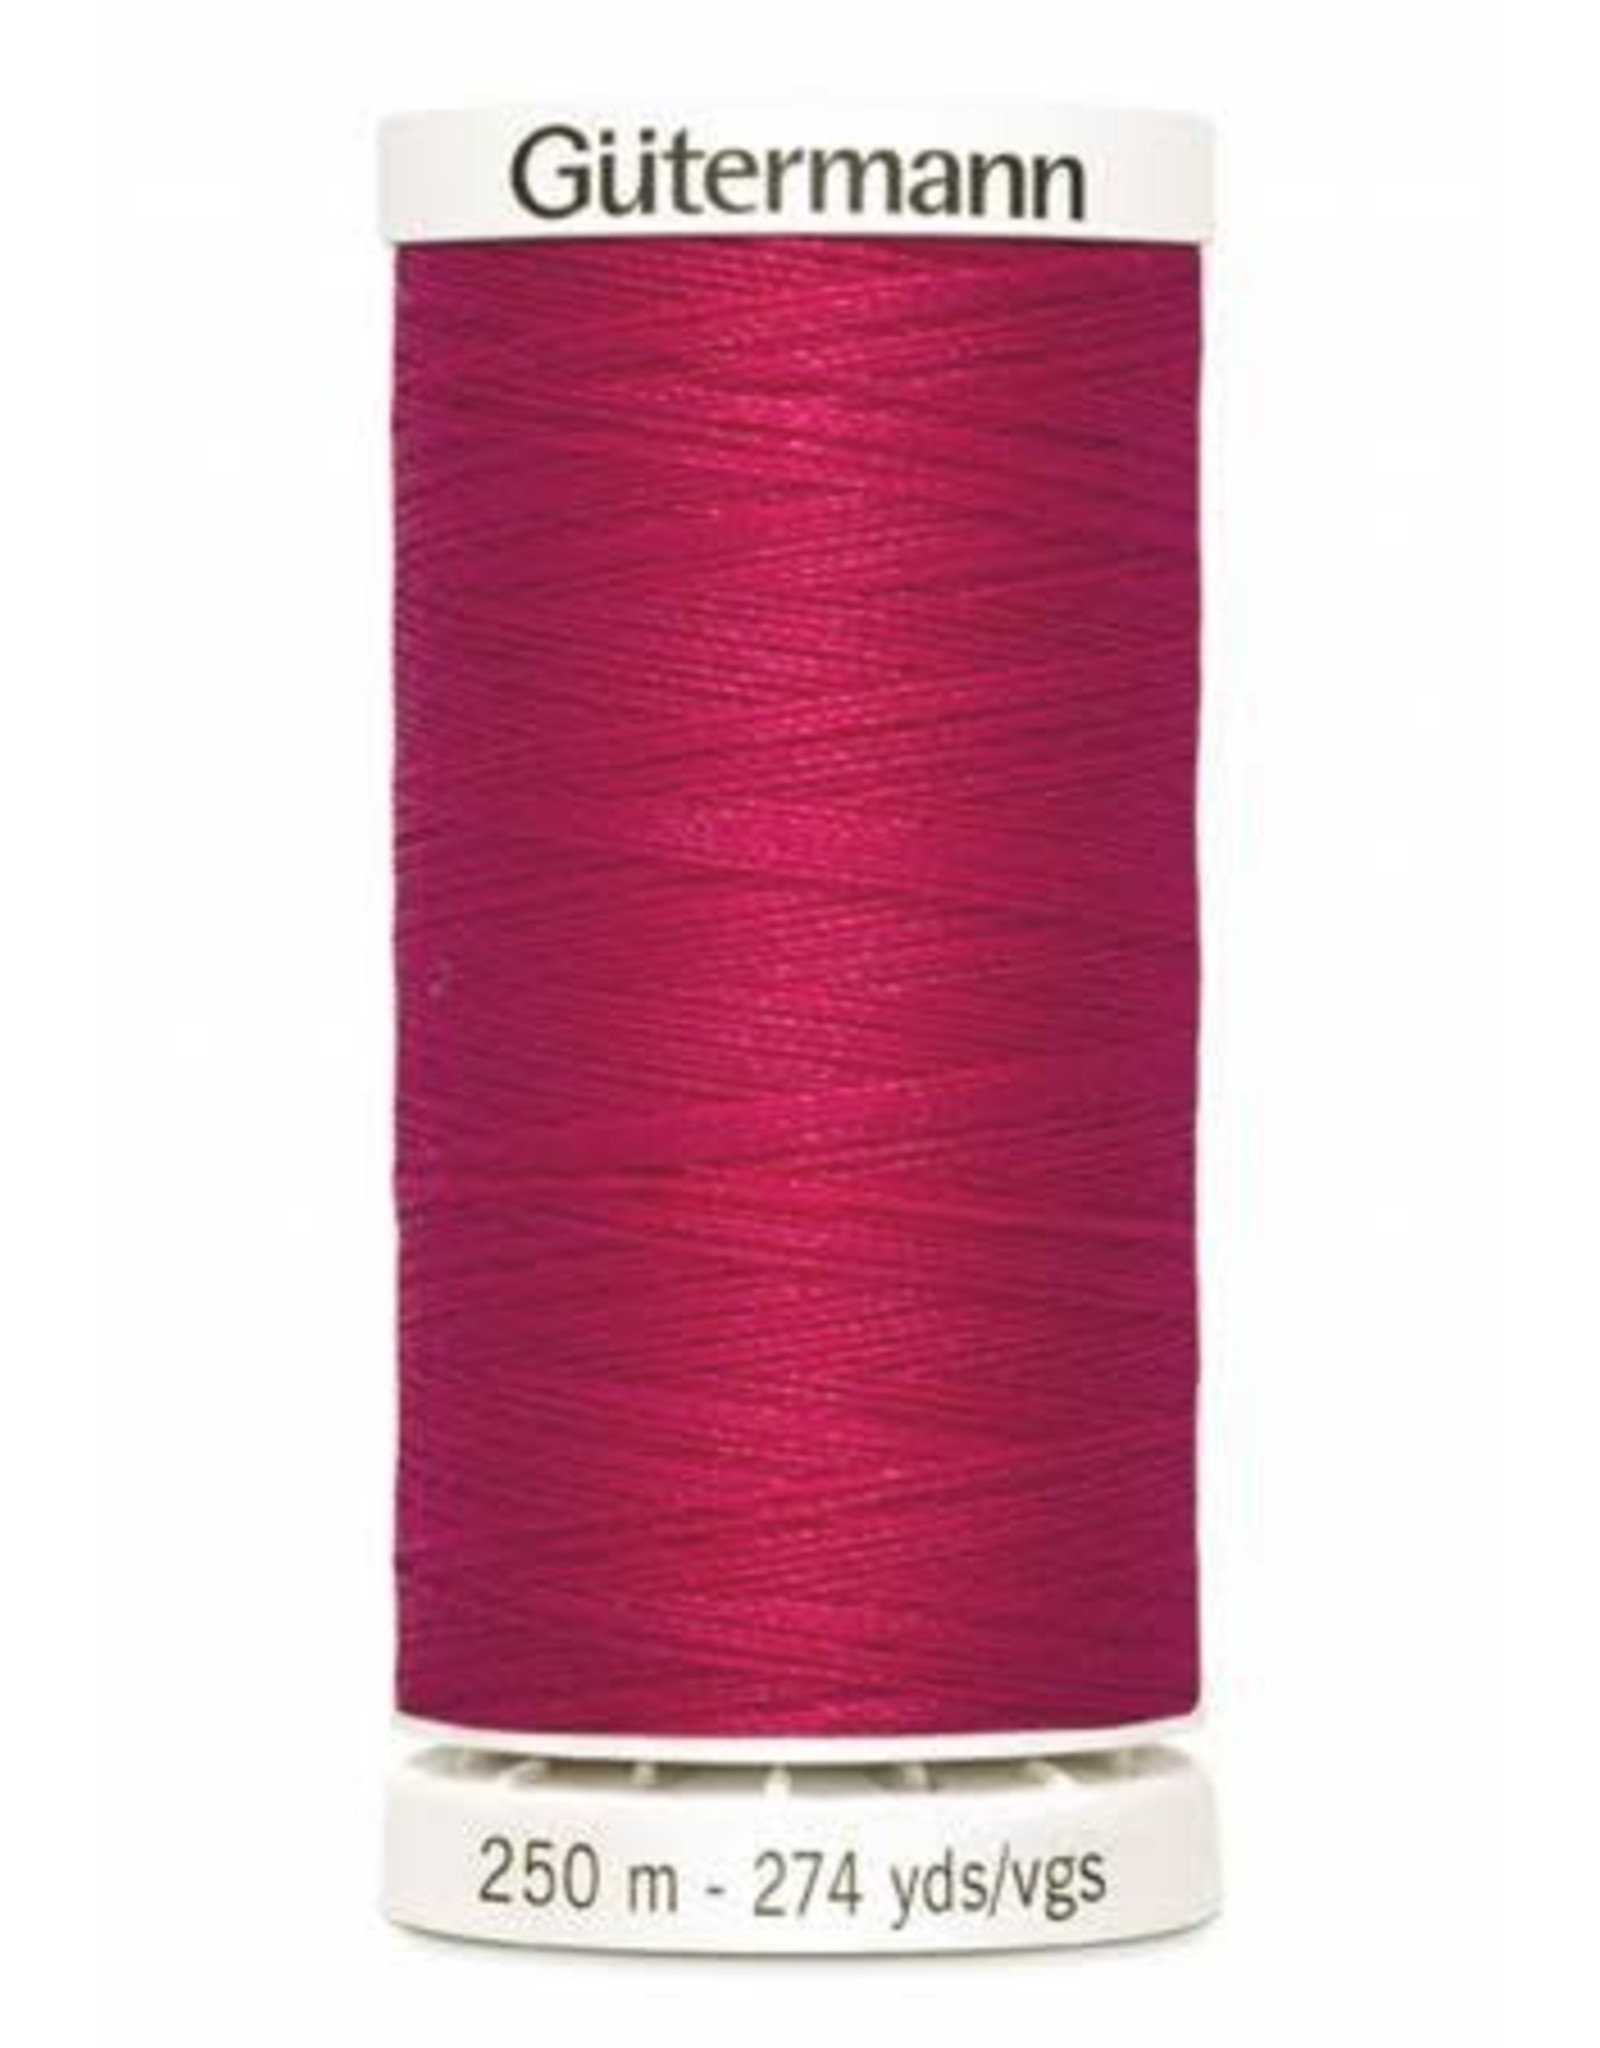 Gutermann Gutermann Thread, 250M-345 Raspberry Pink, Sew-All Polyester All Purpose Thread, 250m/273yds